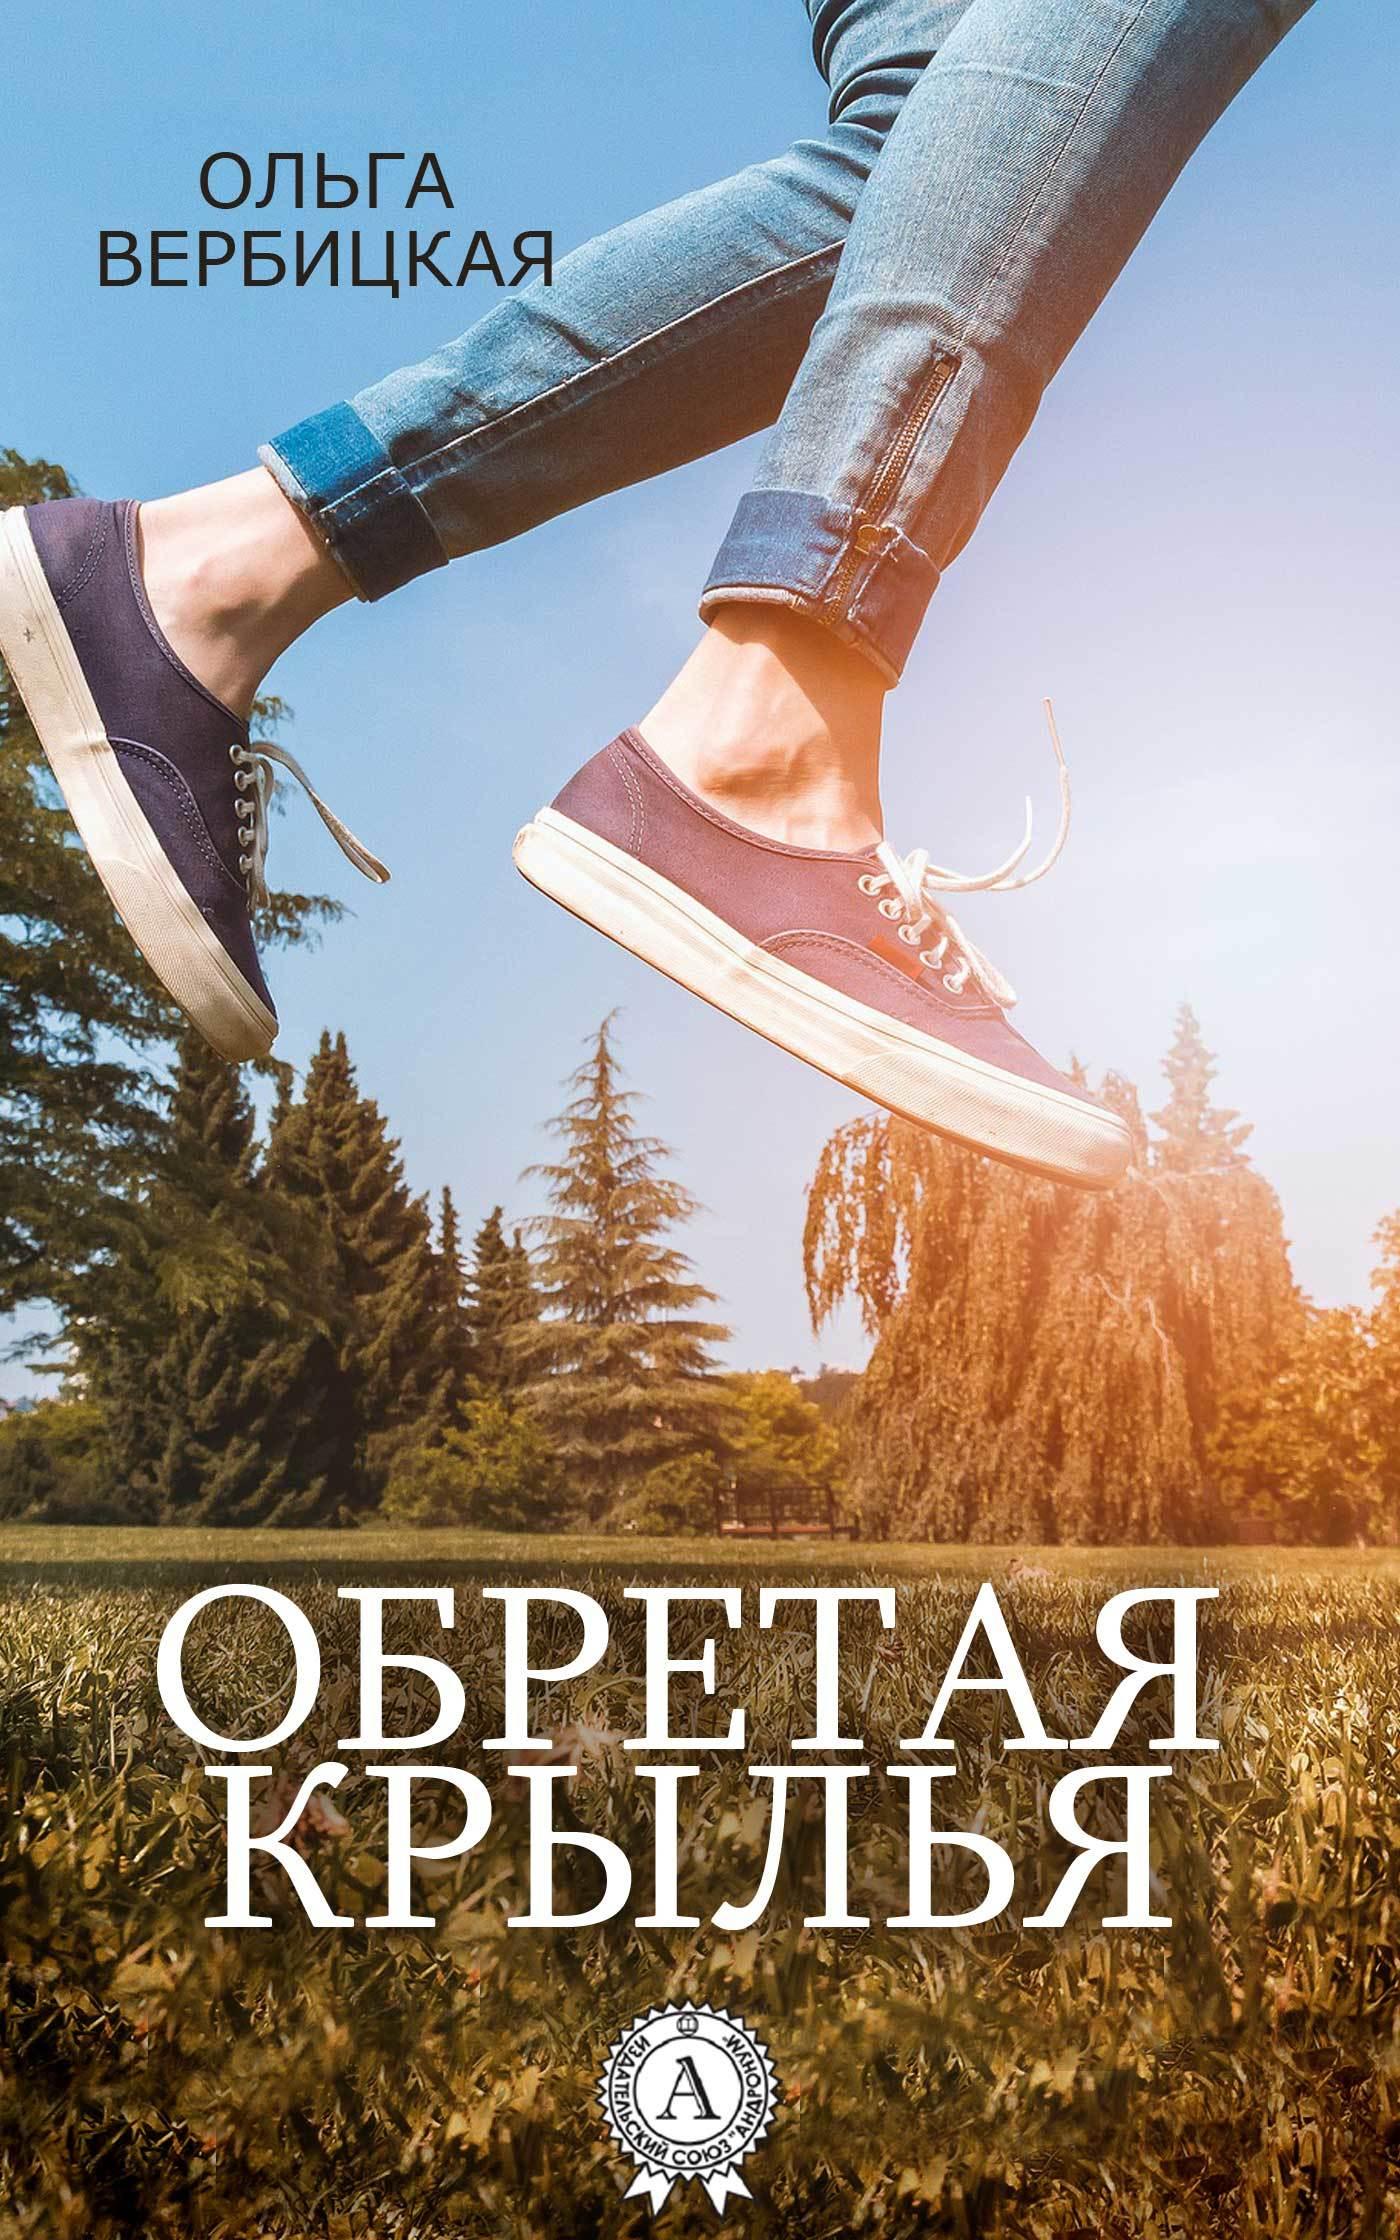 Ольга Вербицкая. Обретая крылья